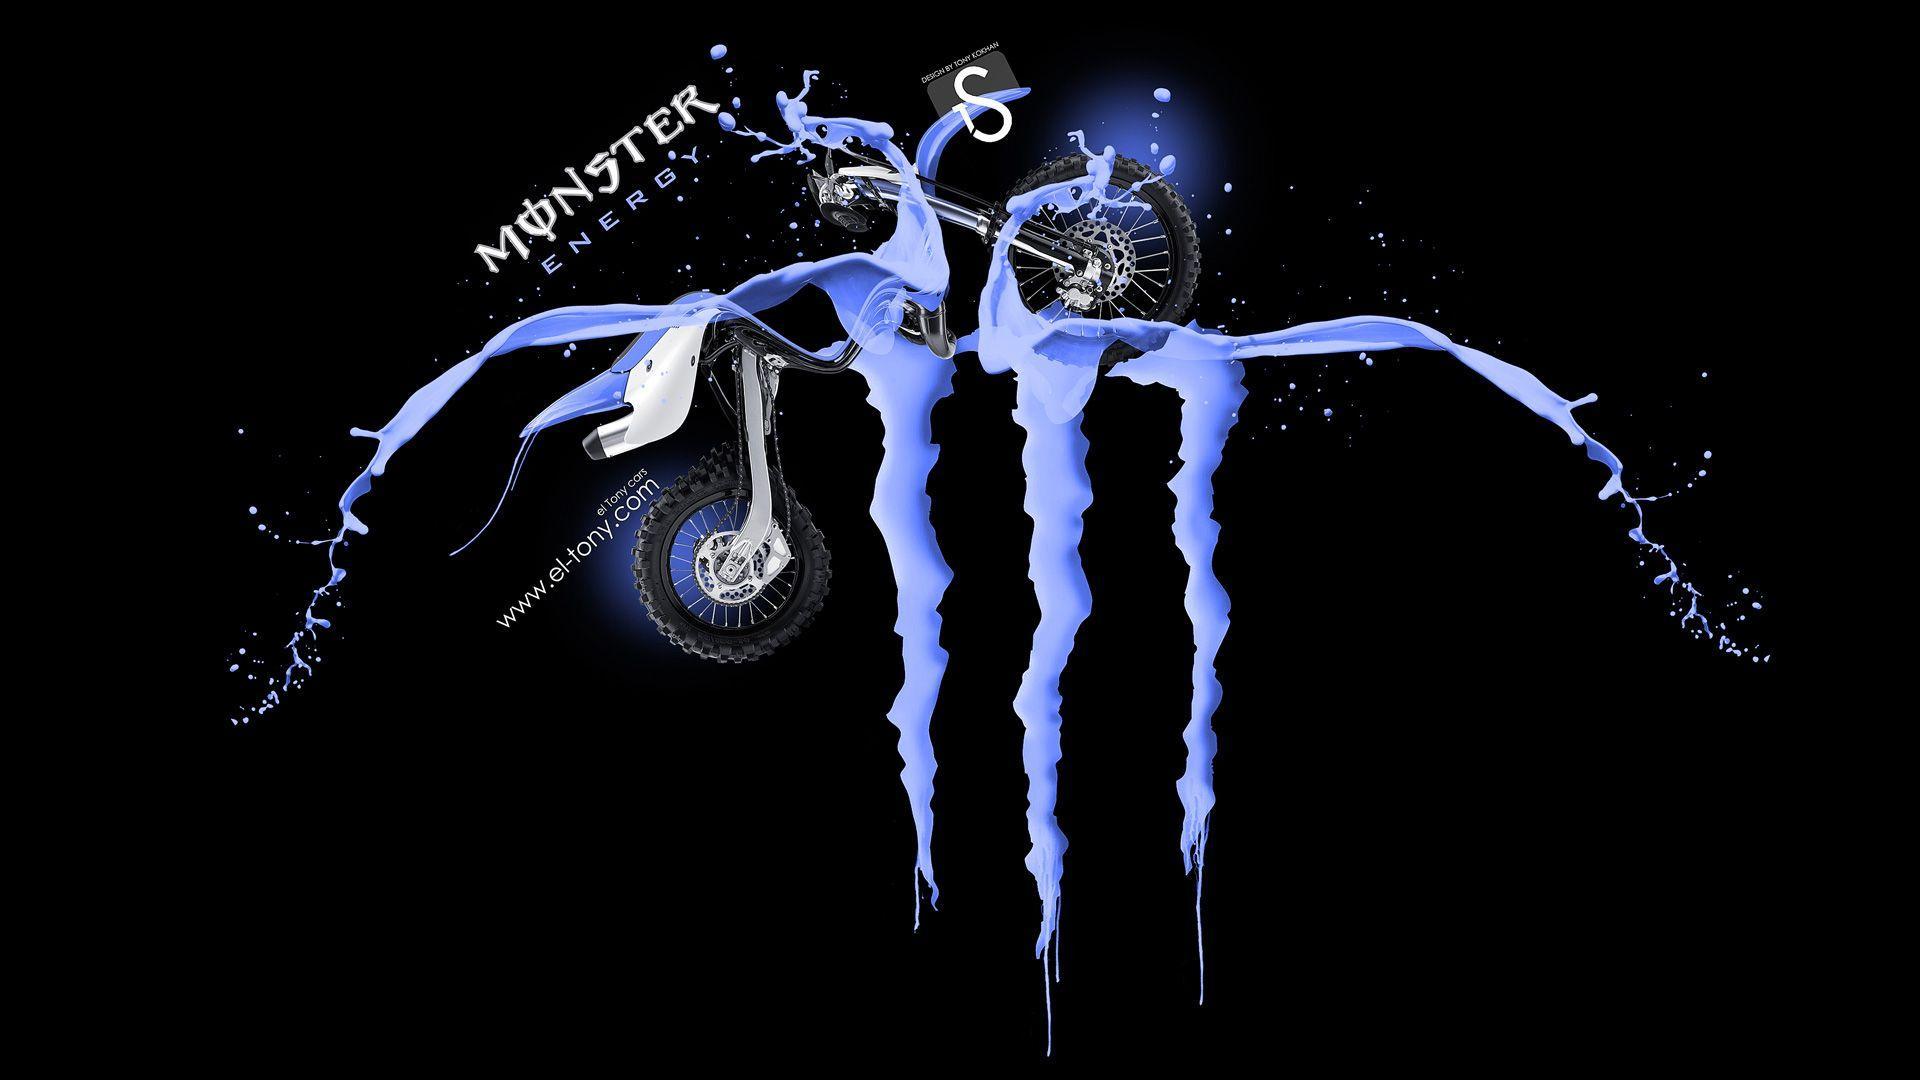 Monster energy logo backgrounds wallpaper cave monster energy logo blue fantasy wallpaper 2875 wallpaper wall voltagebd Images